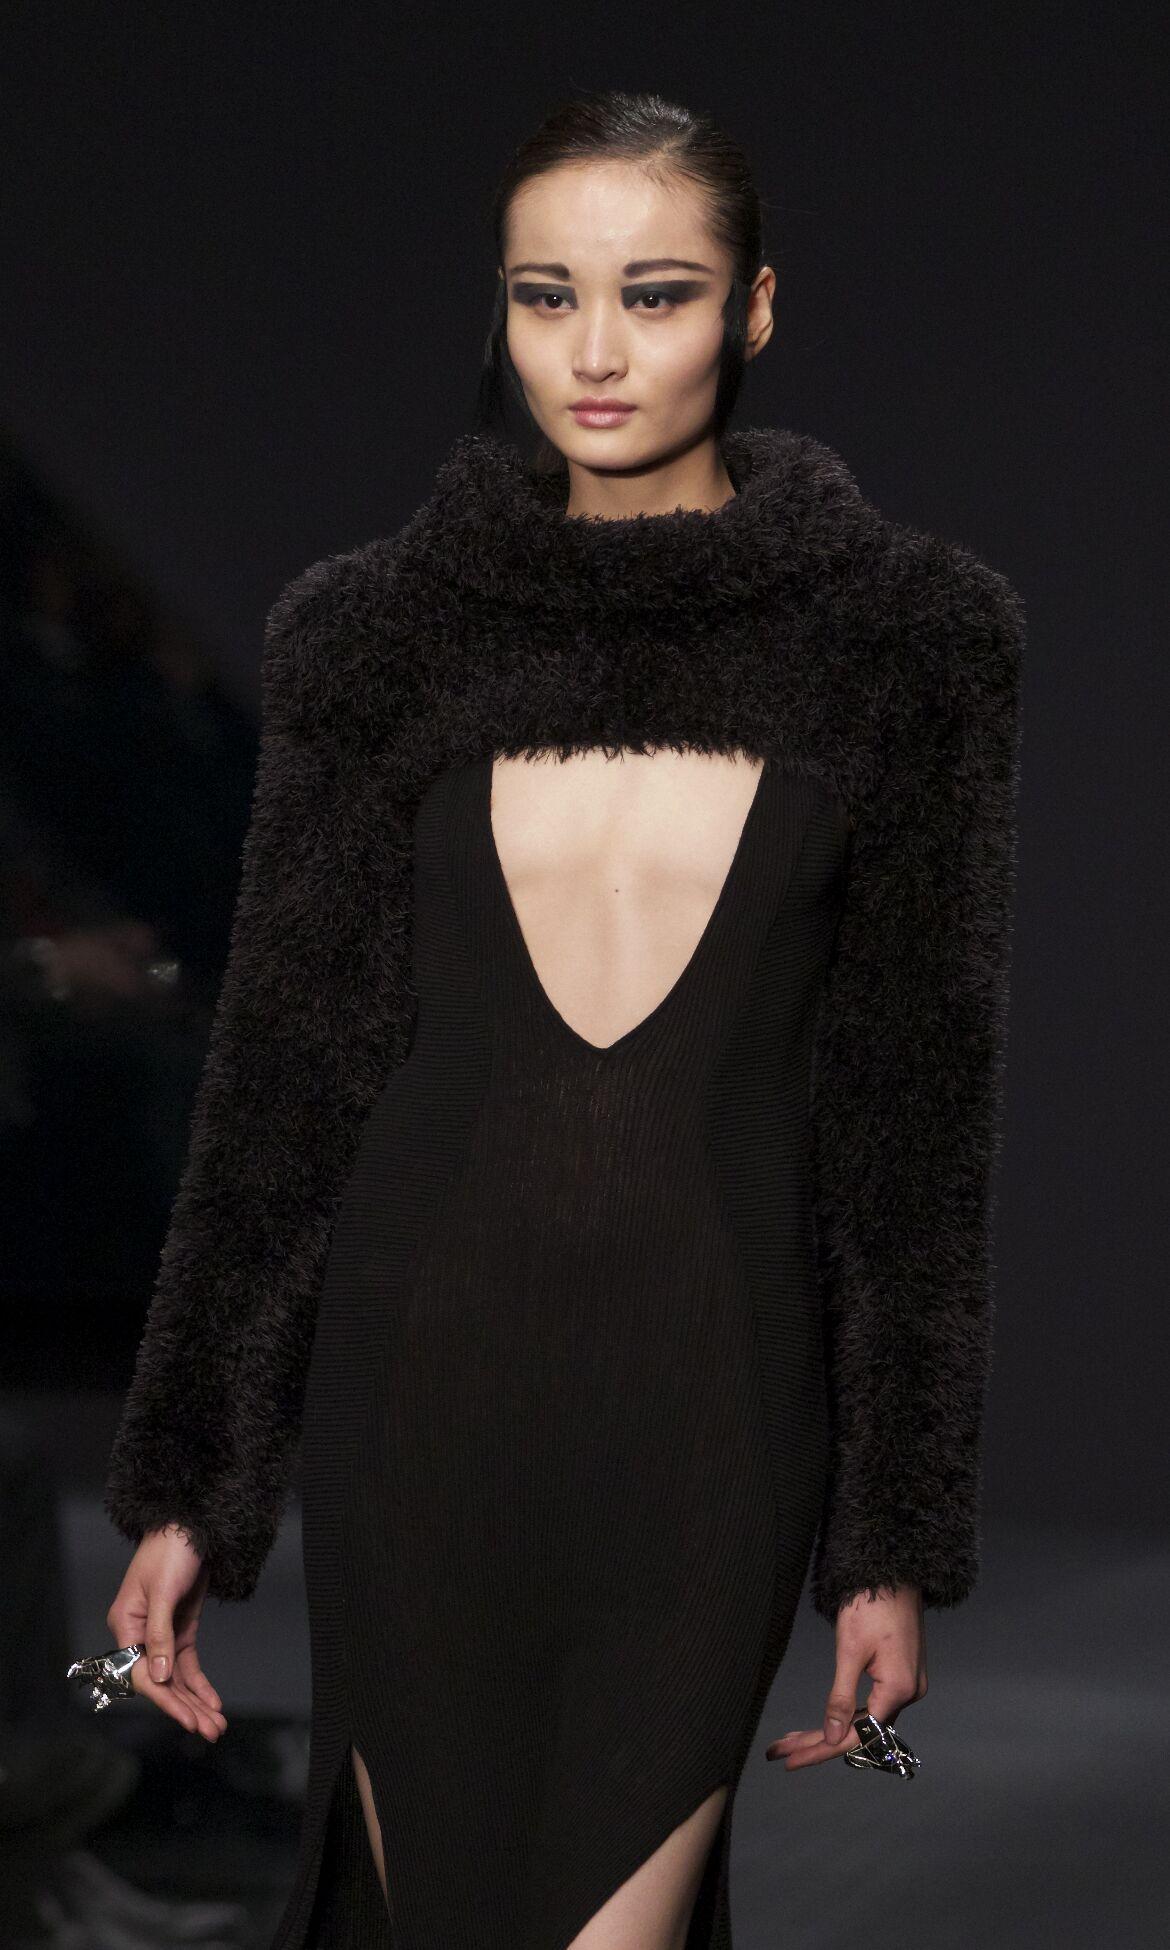 Catwalk Krizia Fashion Show Winter 2013 Womenswear